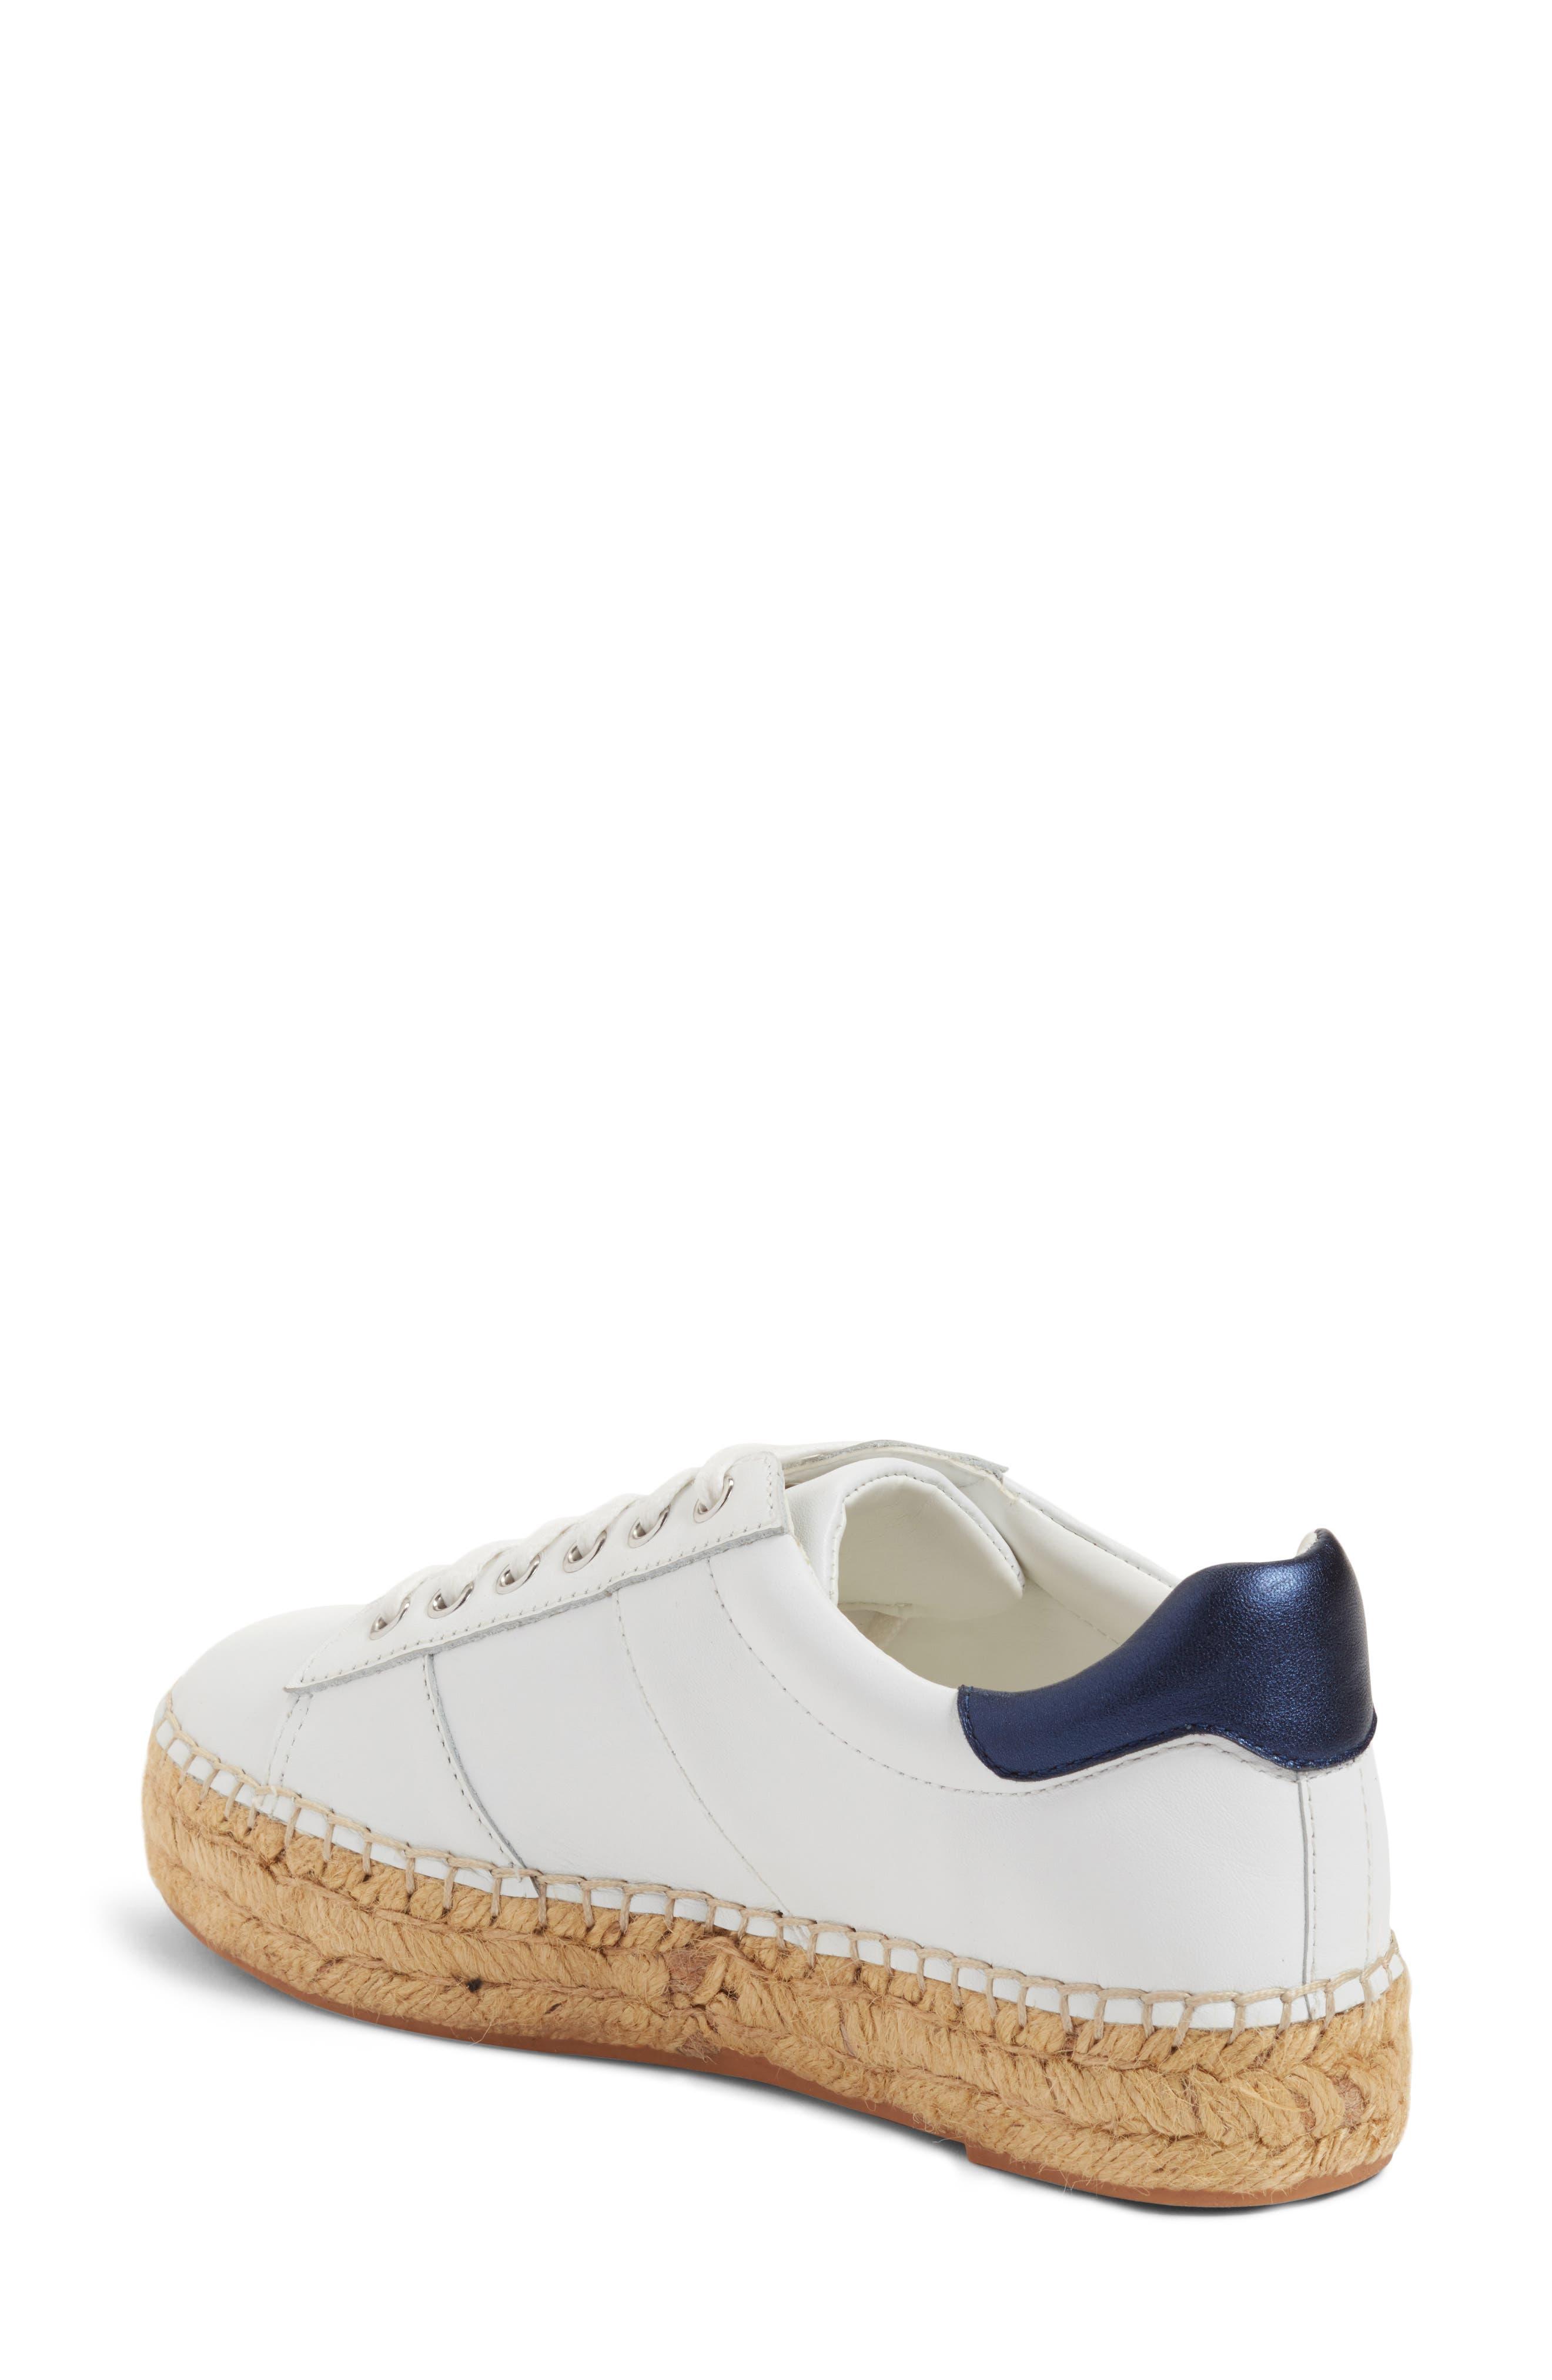 Marge Espadrille Platform Sneaker,                             Alternate thumbnail 2, color,                             White/ Navy Leather